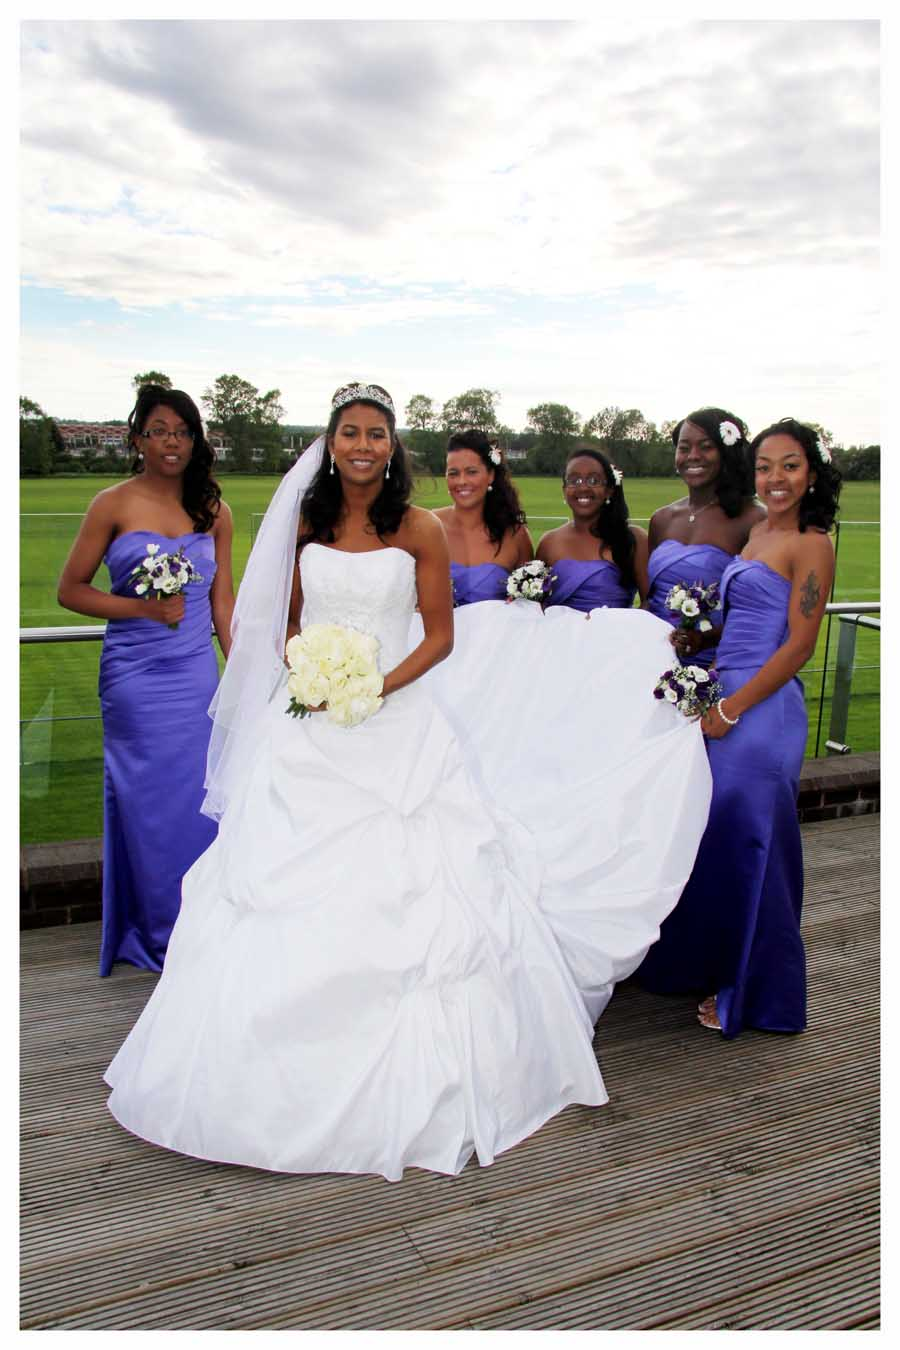 GIRLS Photos by Simeon Thaw copyright 2014 (36).jpg